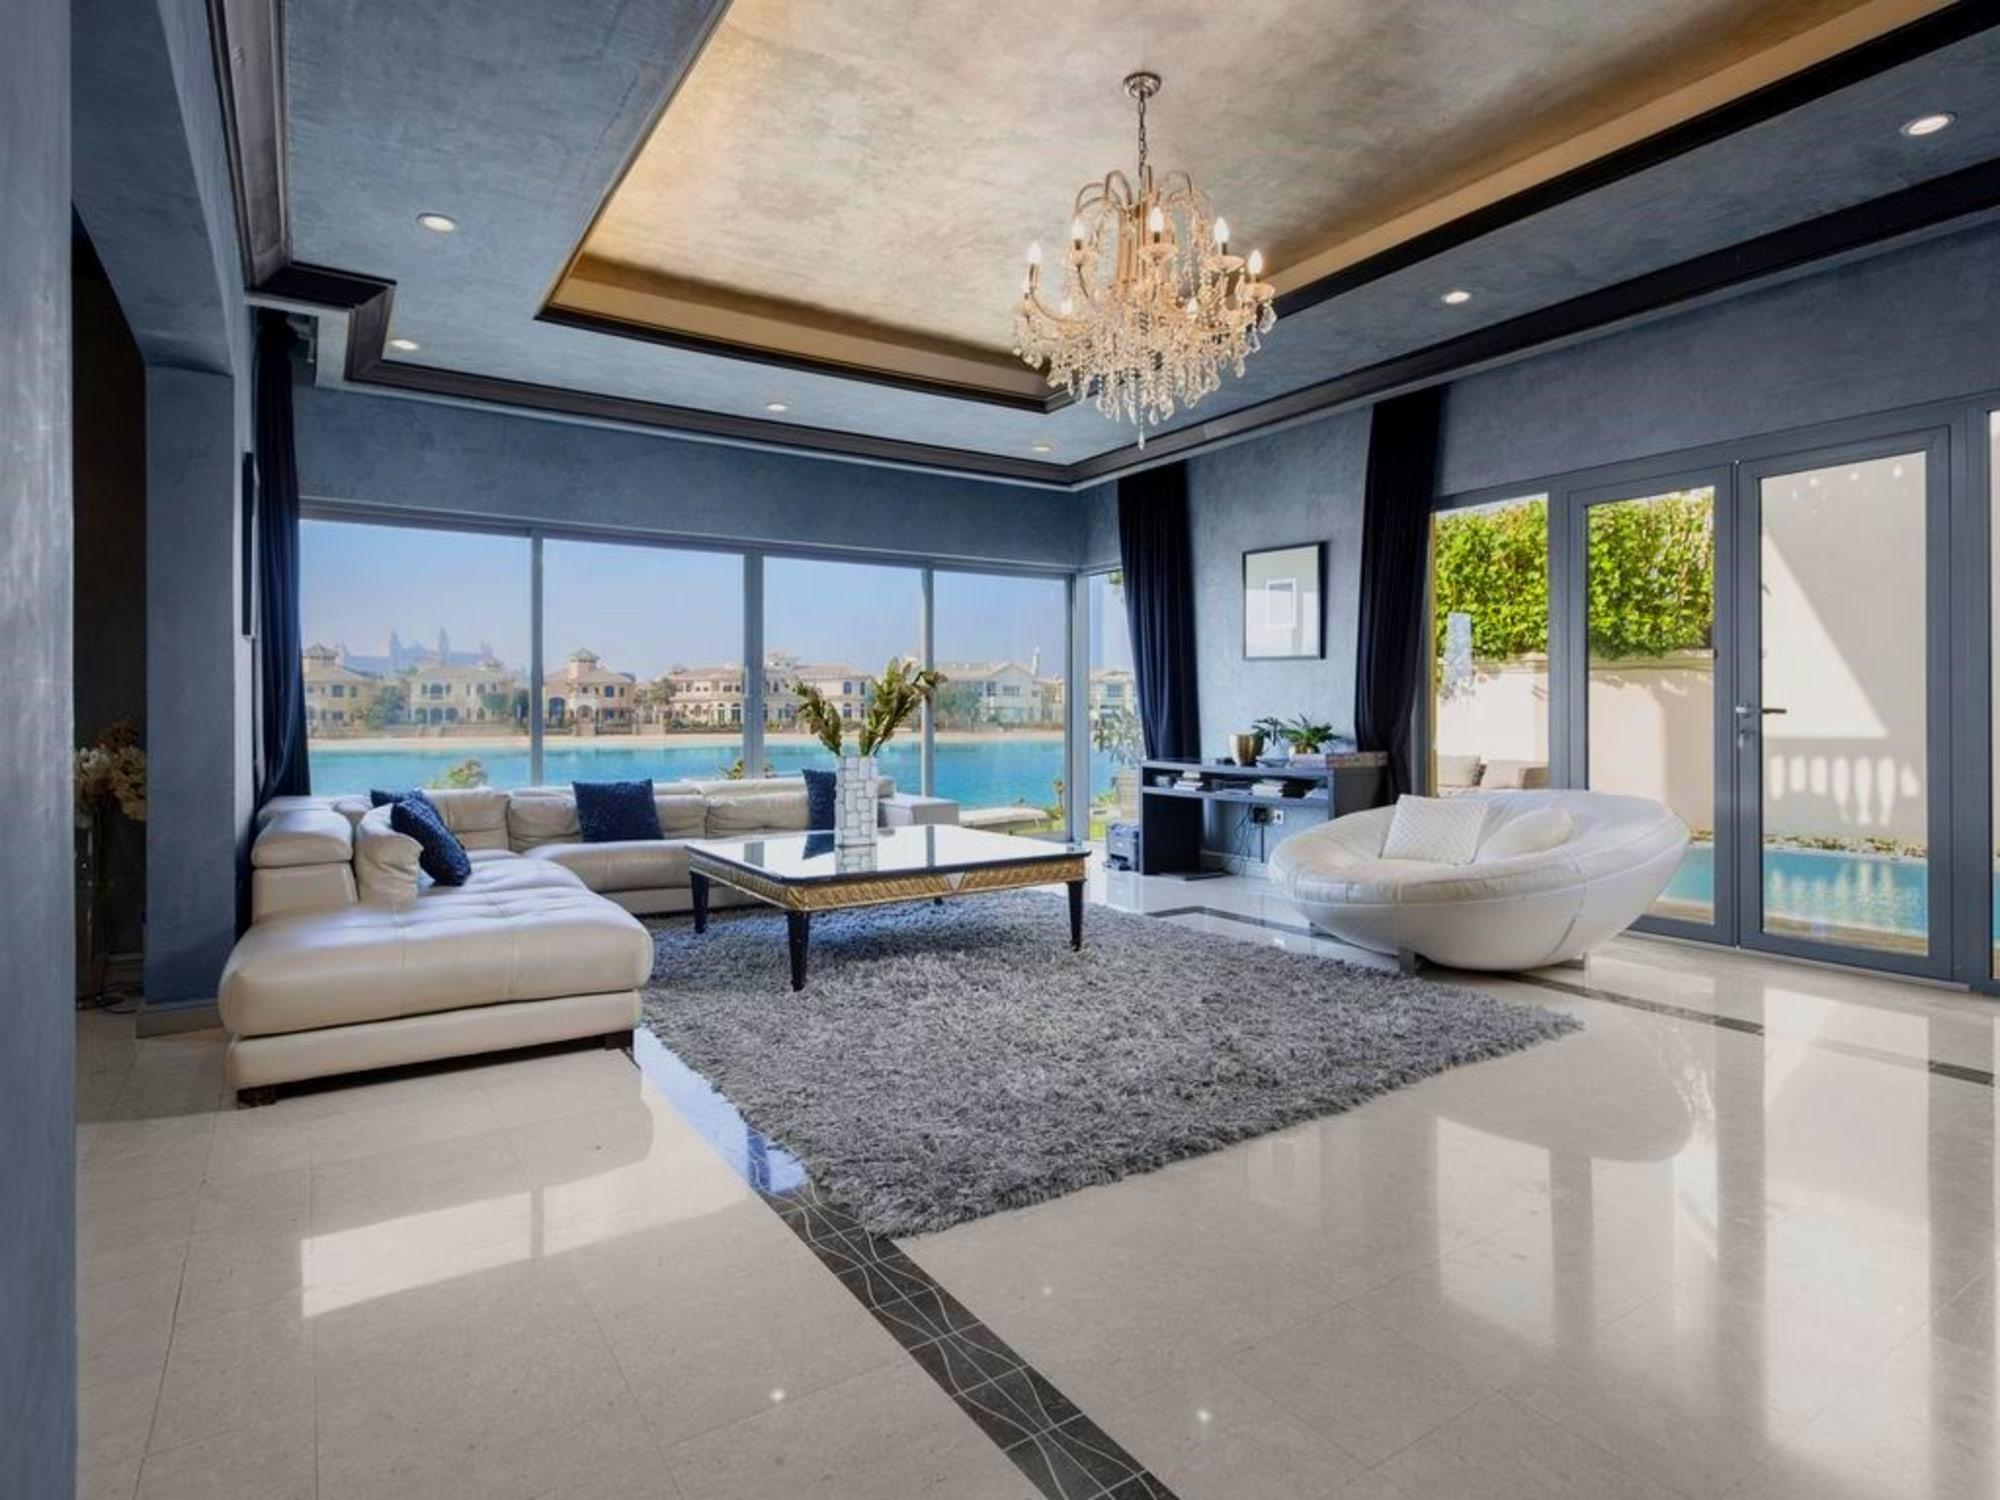 Grand Foyer Type 4BR Villa Atlantis View